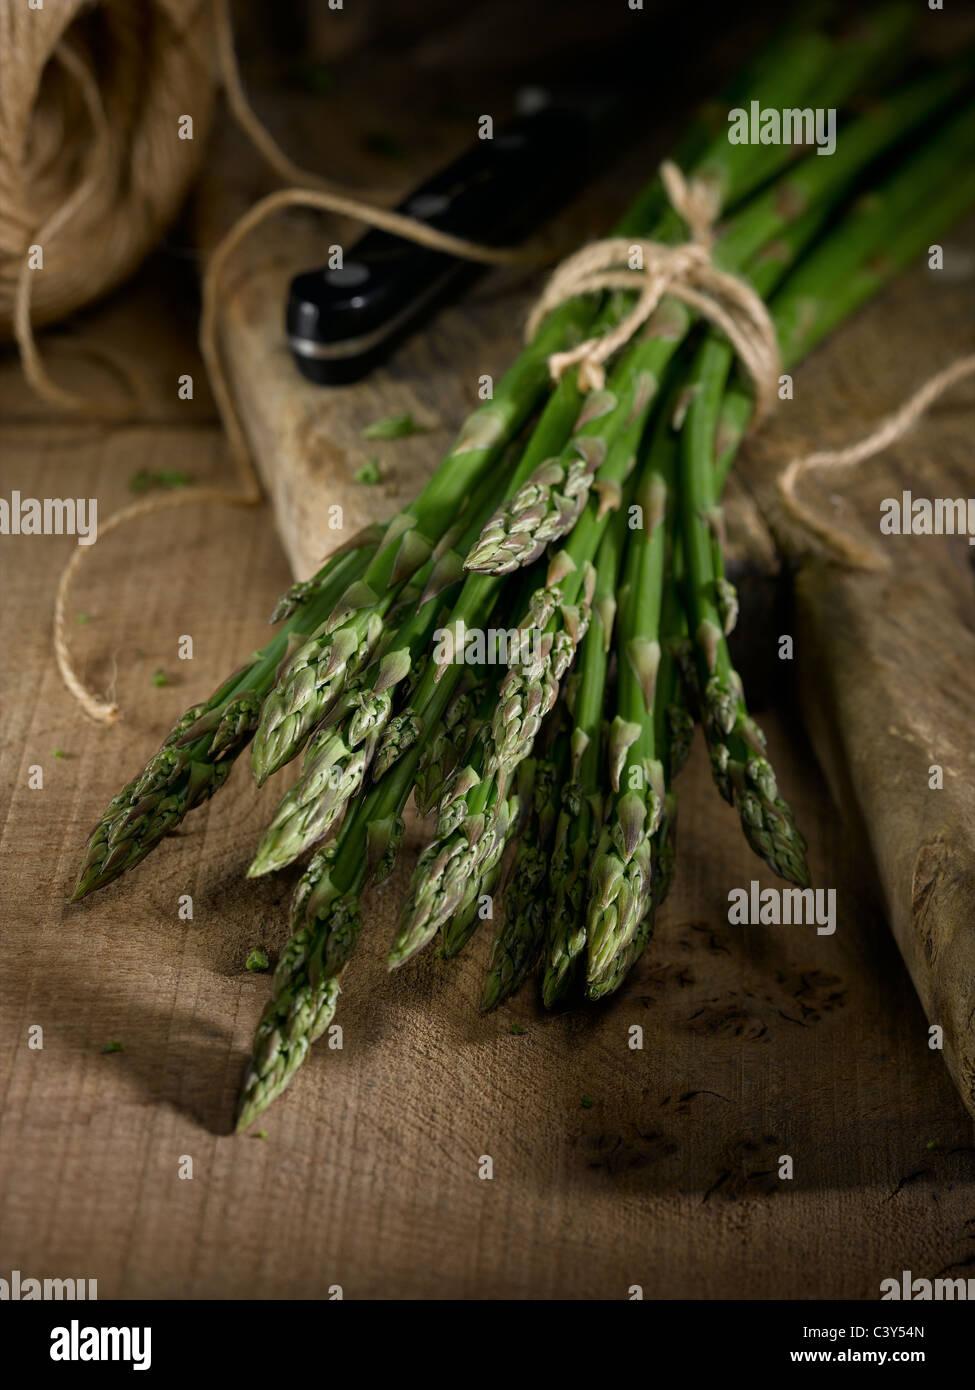 asparagus - Stock Image